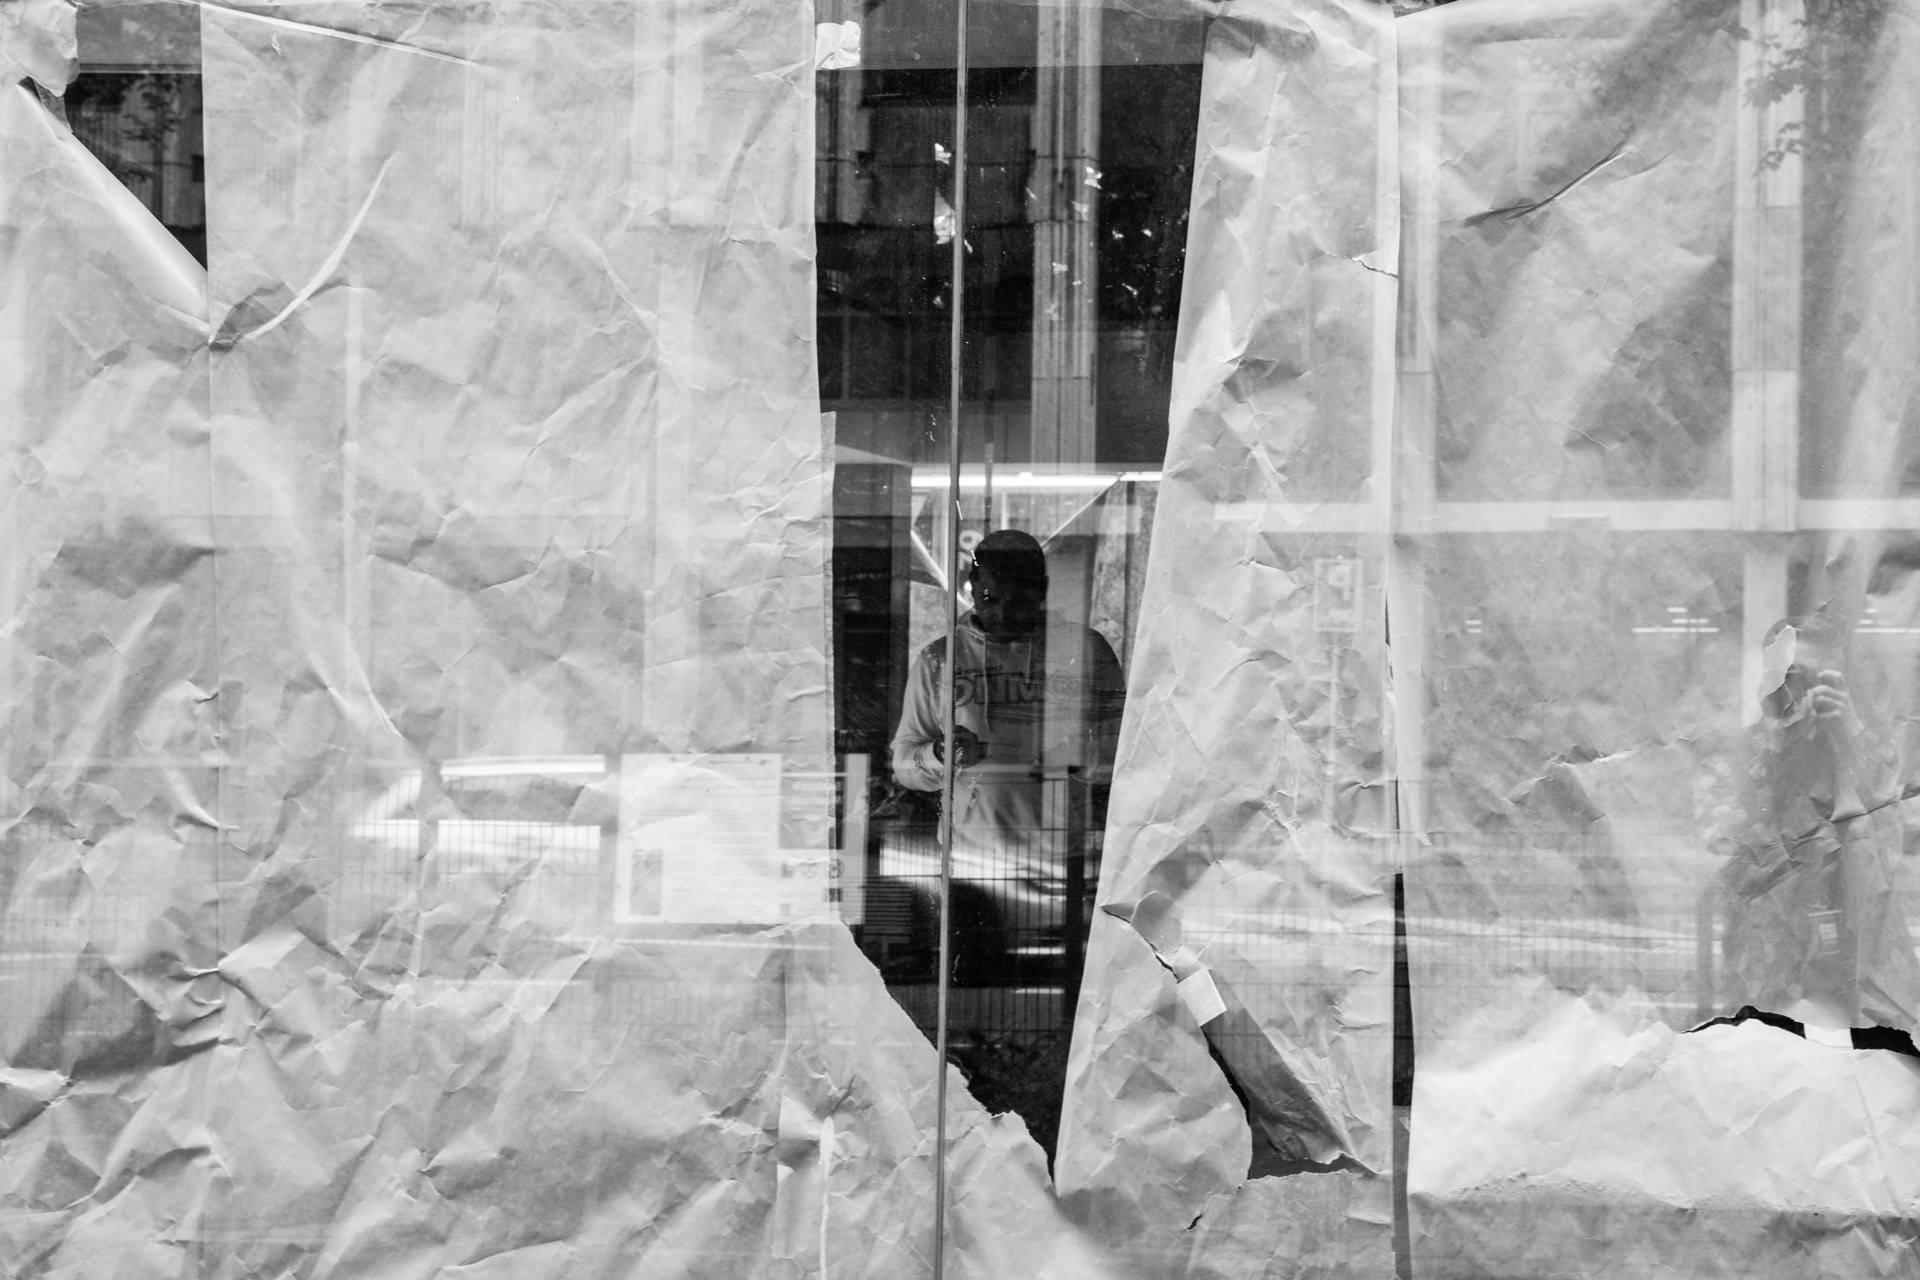 Patrick Dreuning  Heartbeat of construction #1